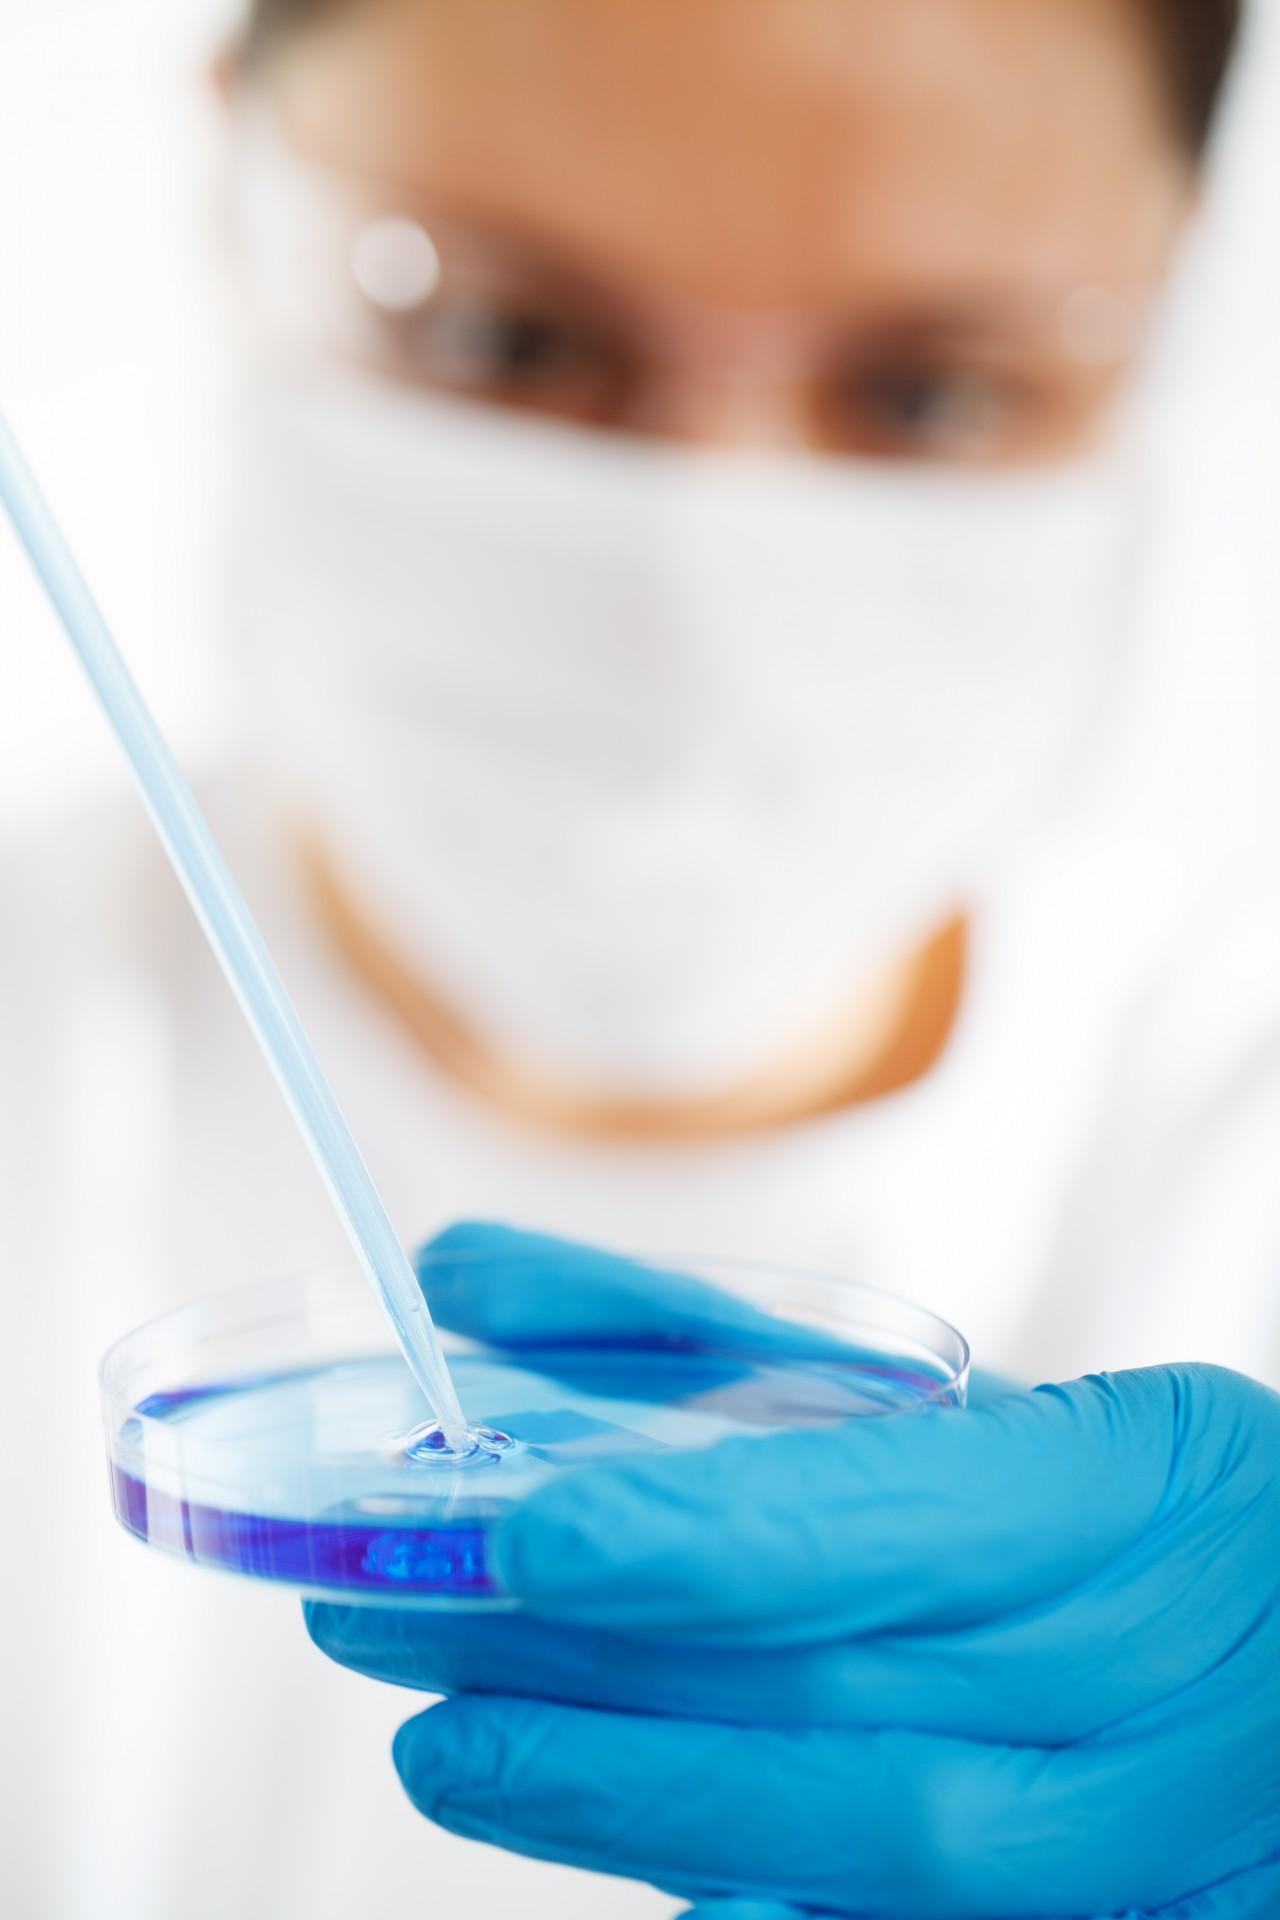 antibiotic resistance MRSA